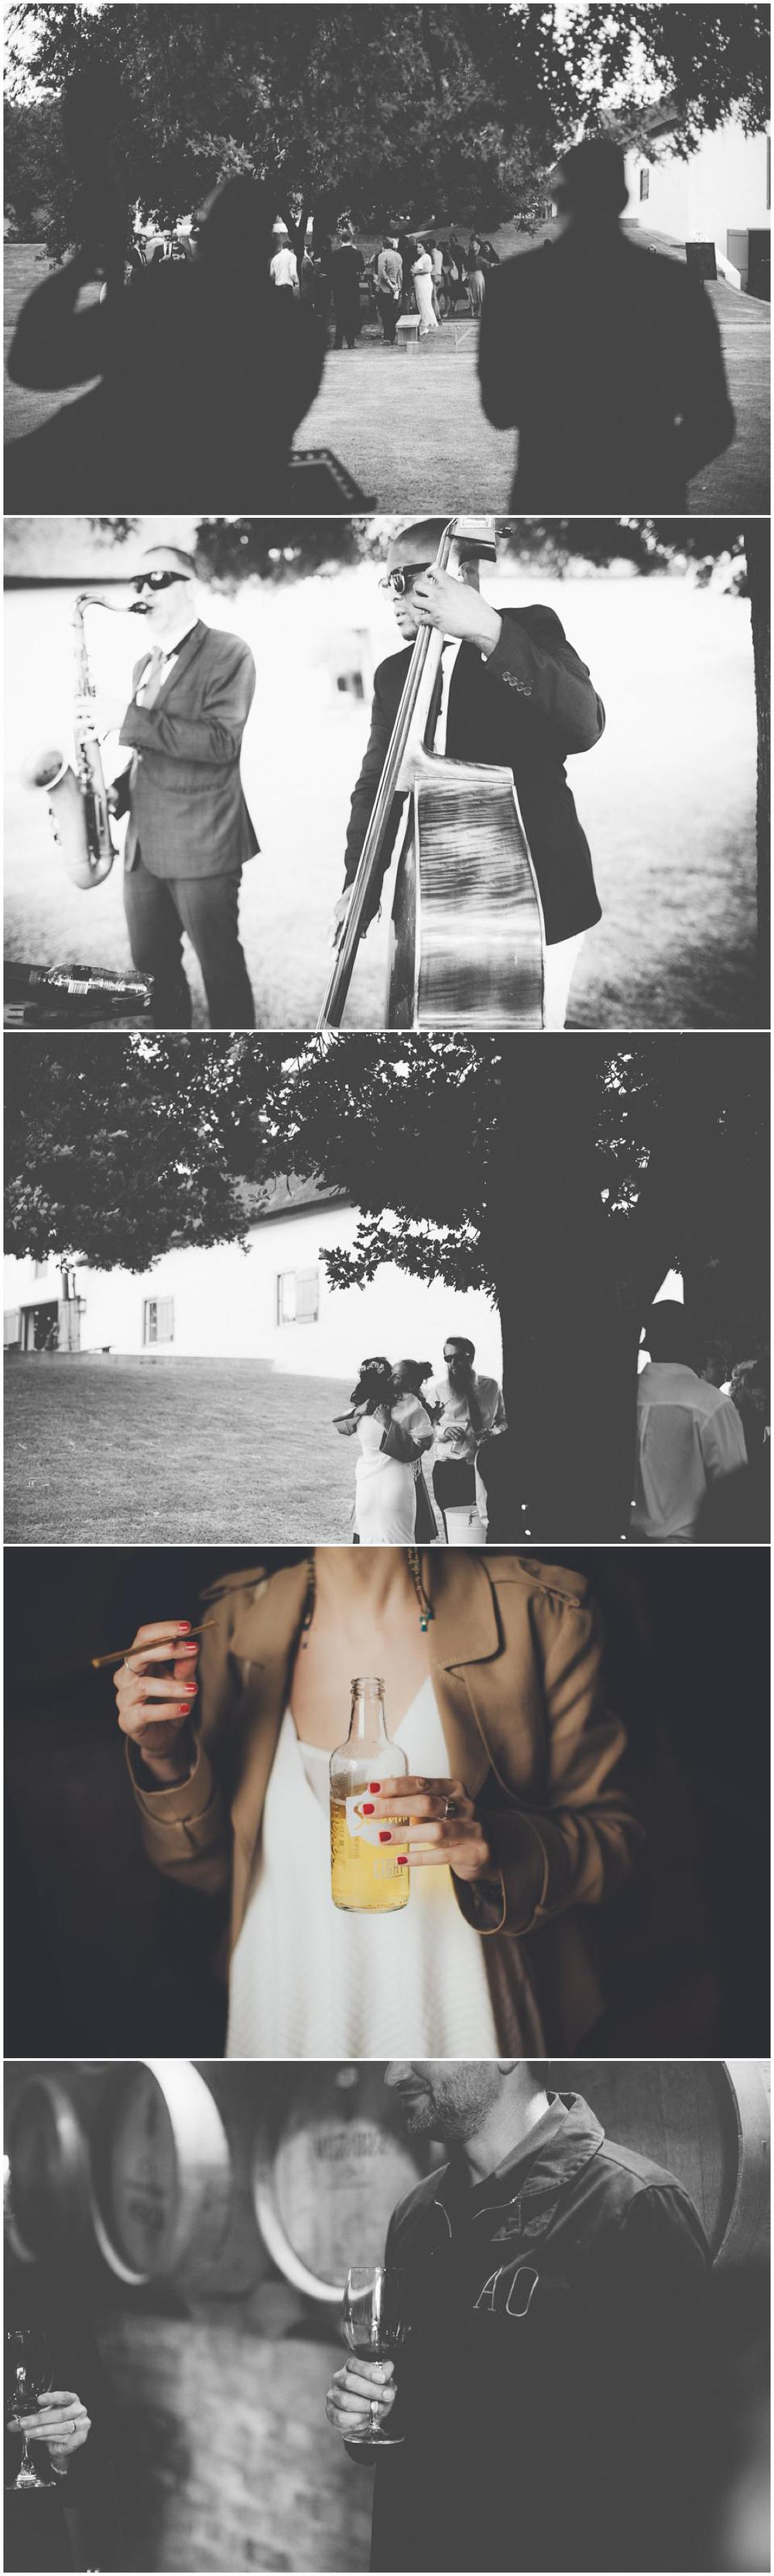 Ruan&Gina_TheOaks_FionaClairPhotography-119.jpg